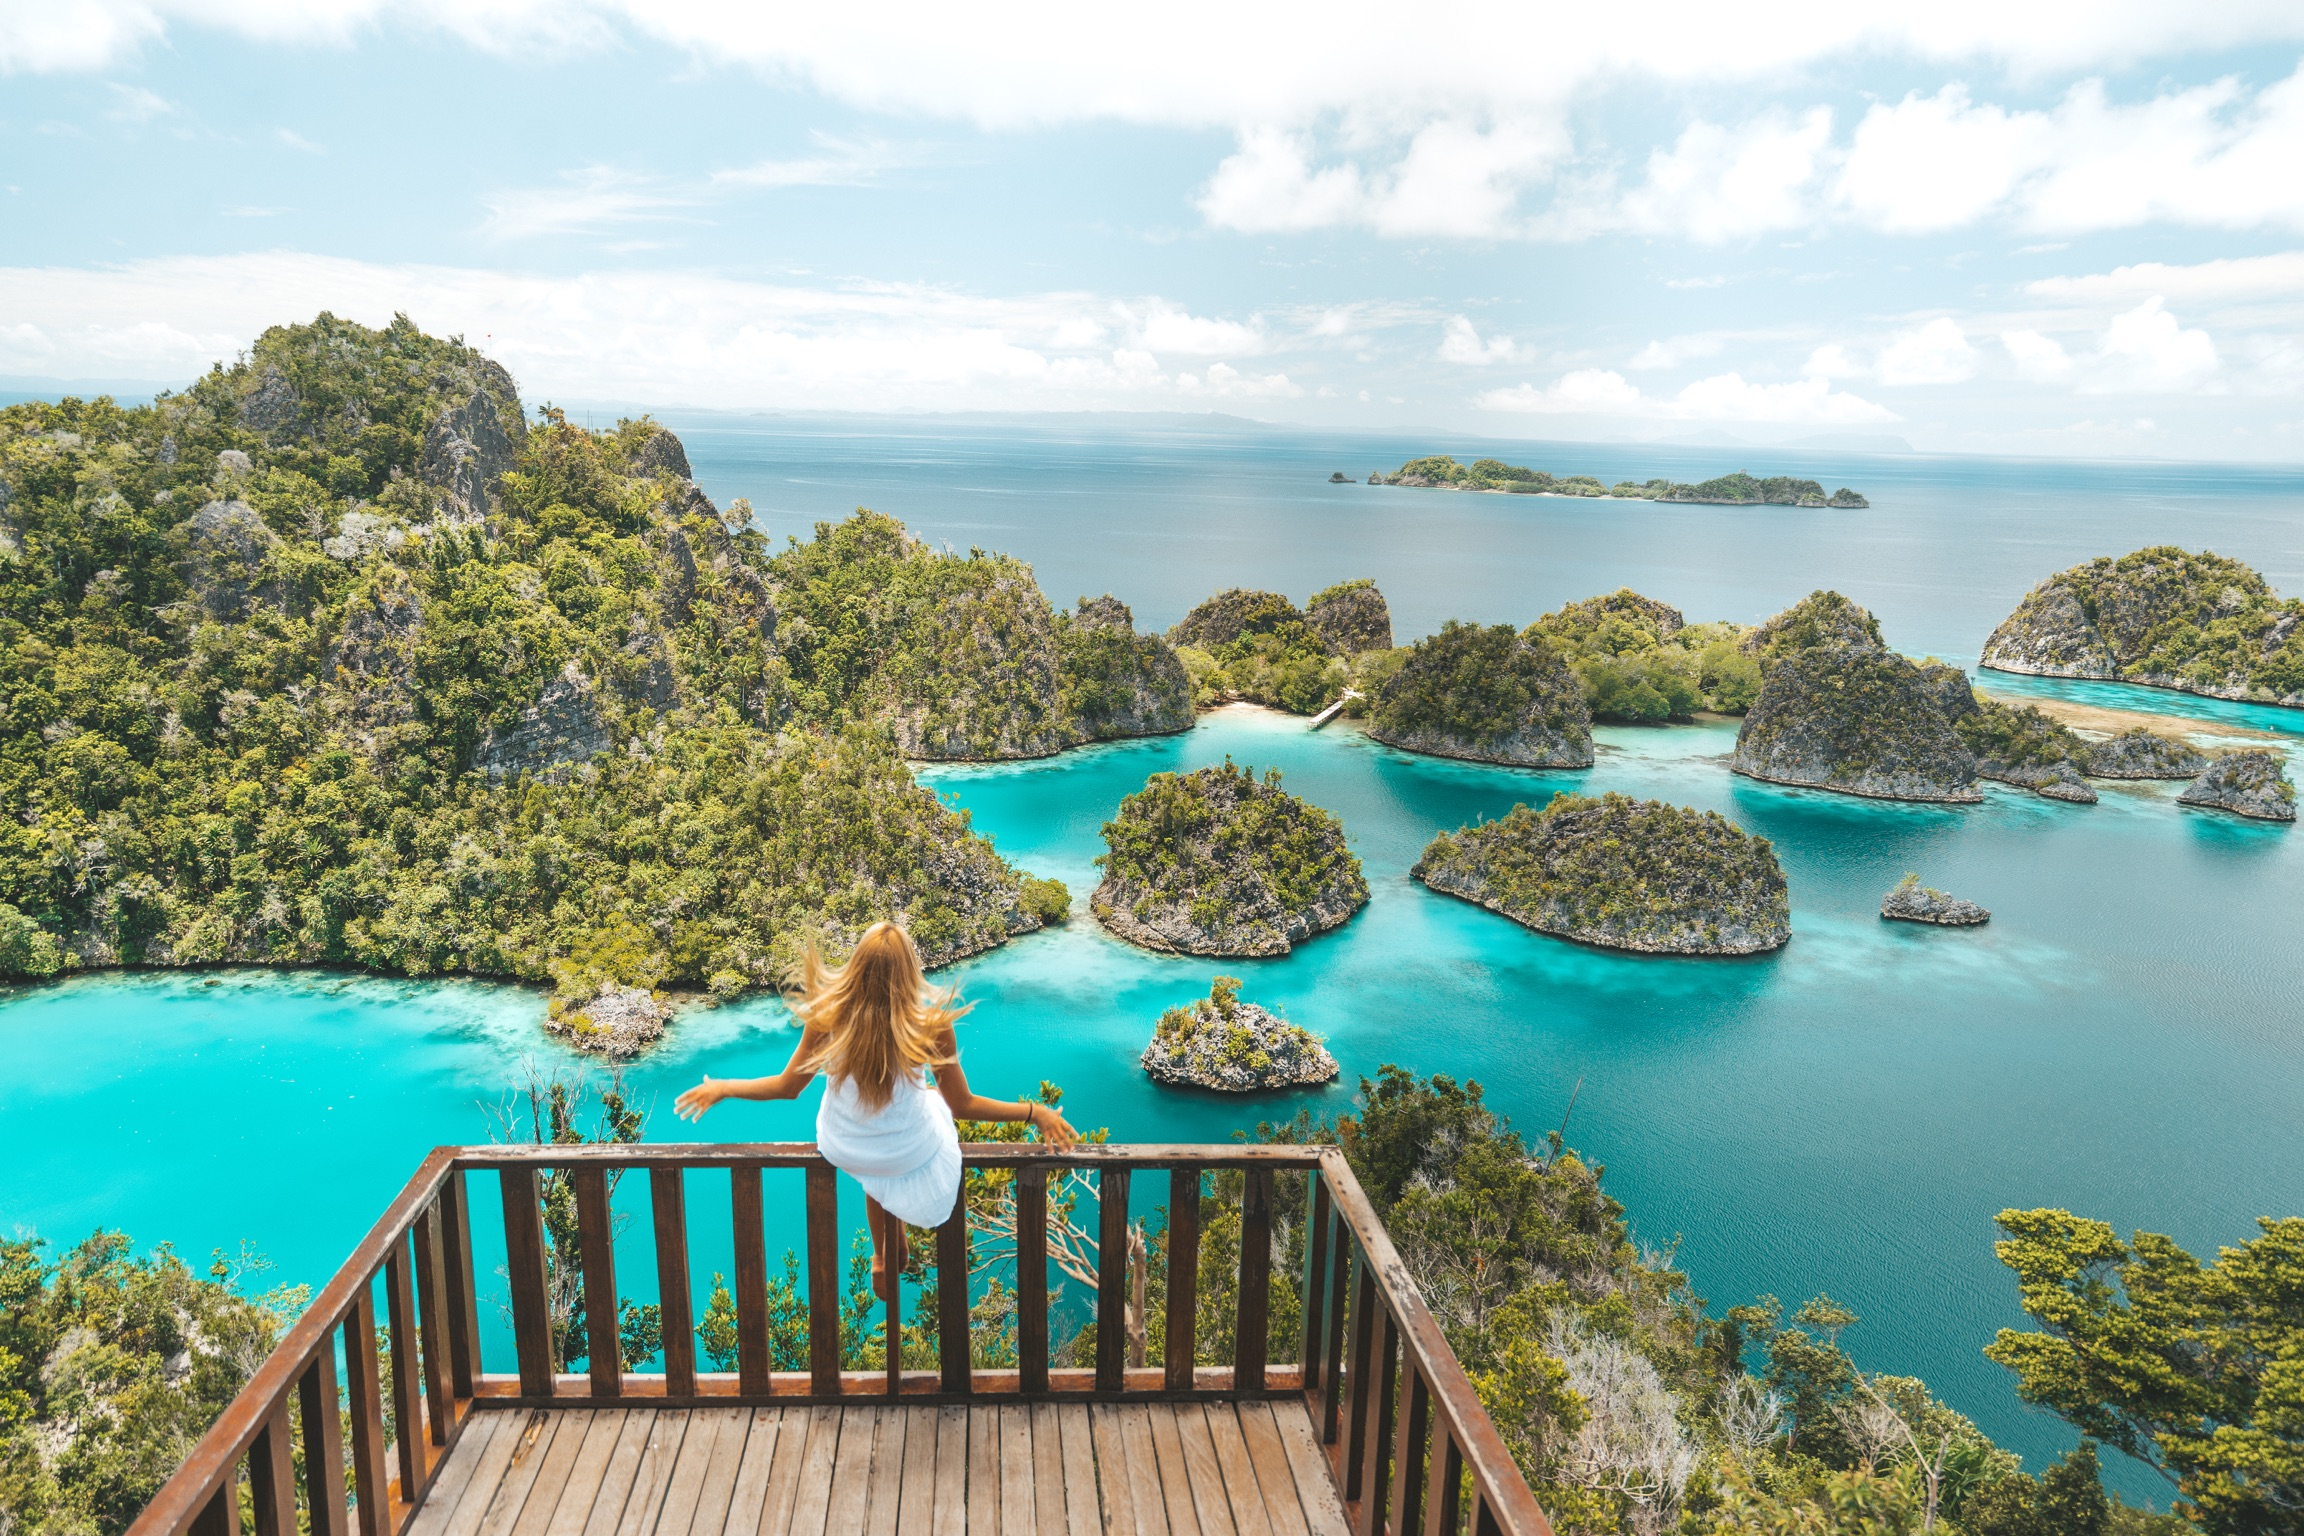 enchanting underwater scenery of Raja Ampat